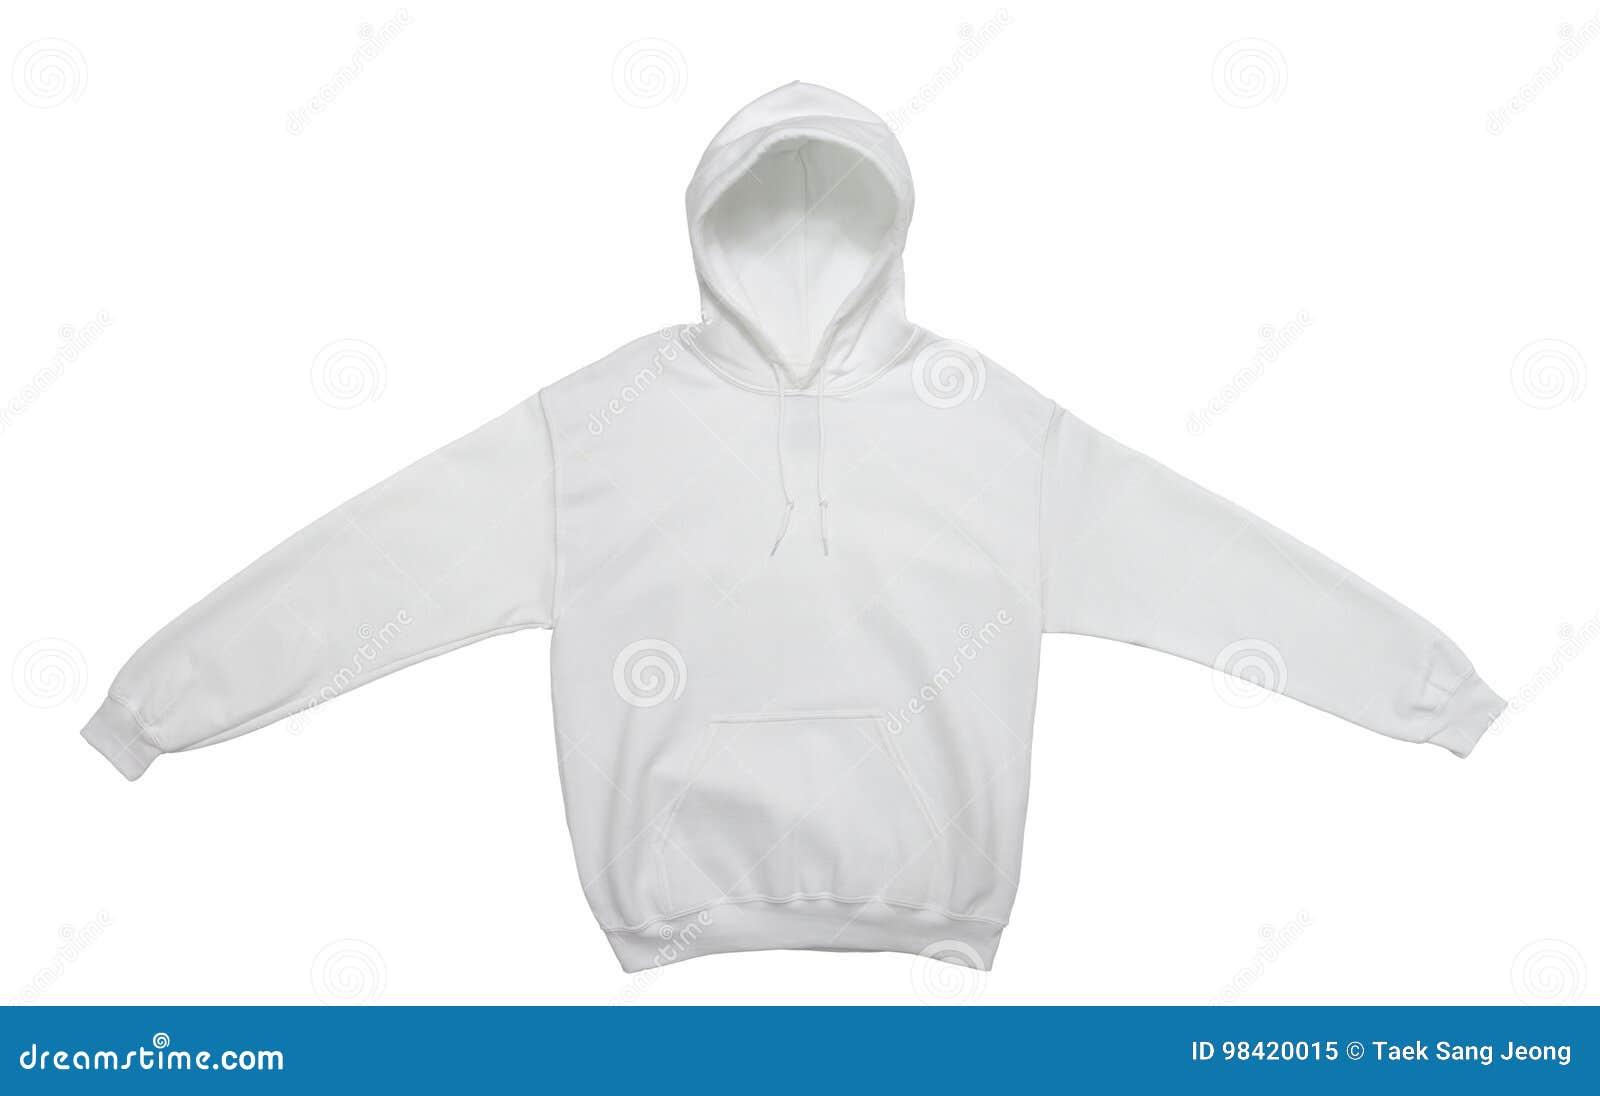 Blank hoodie sweatshirt color white front view